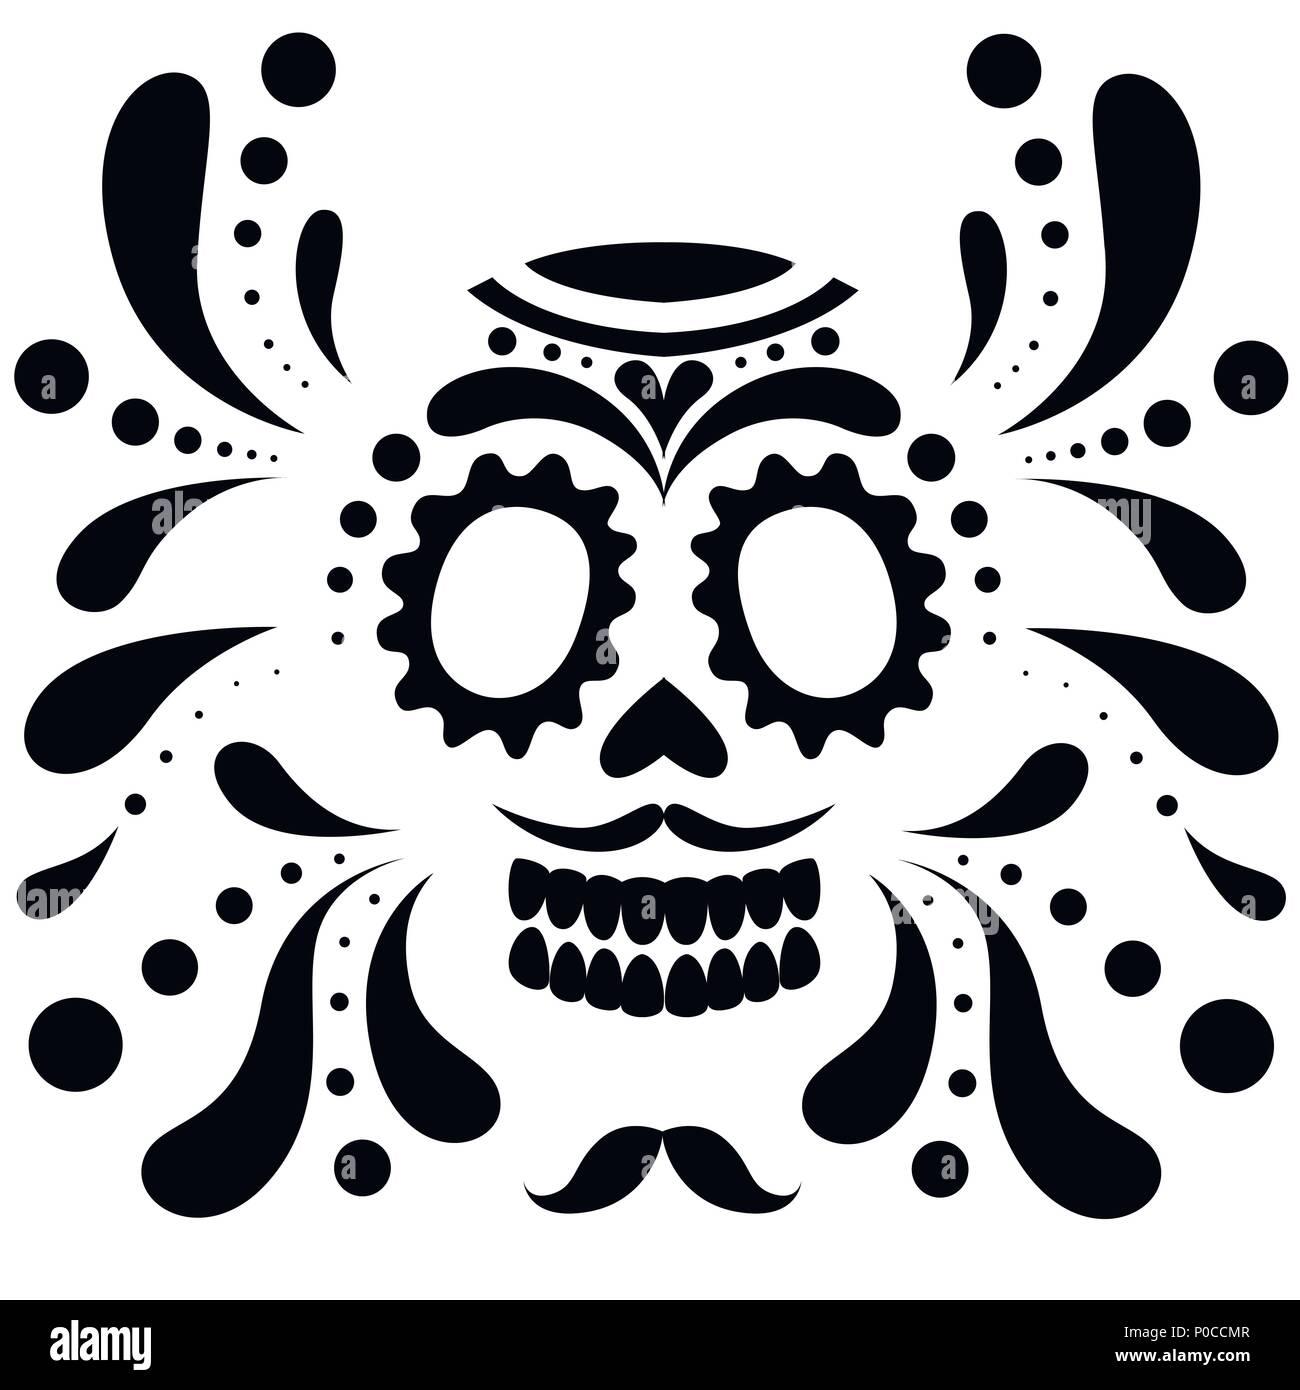 Skull Floral Ornament Day Dead Imágenes De Stock & Skull Floral ...